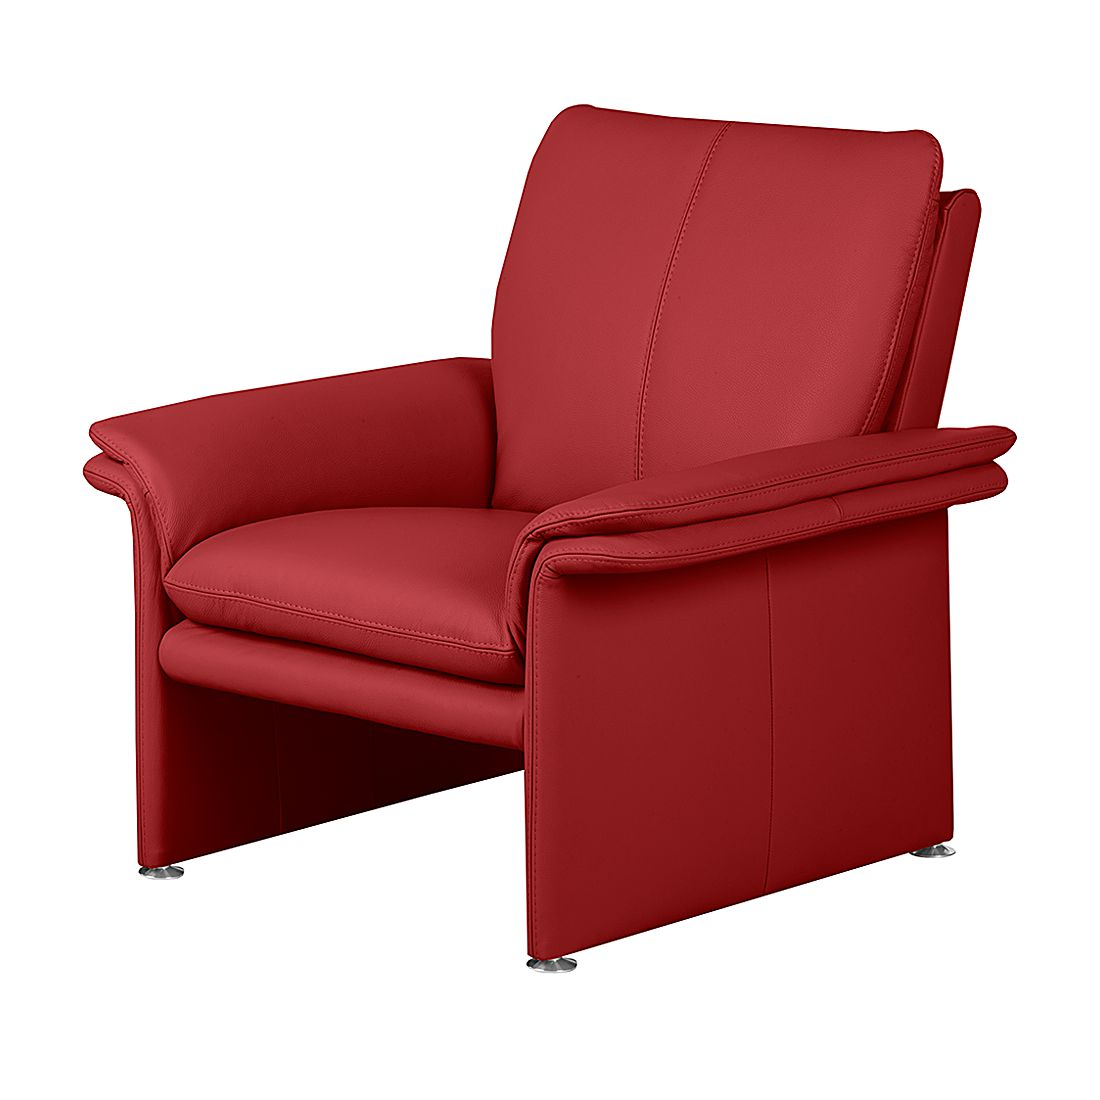 Fauteuil Capri - Cuir véritable rouge, Nuovoform